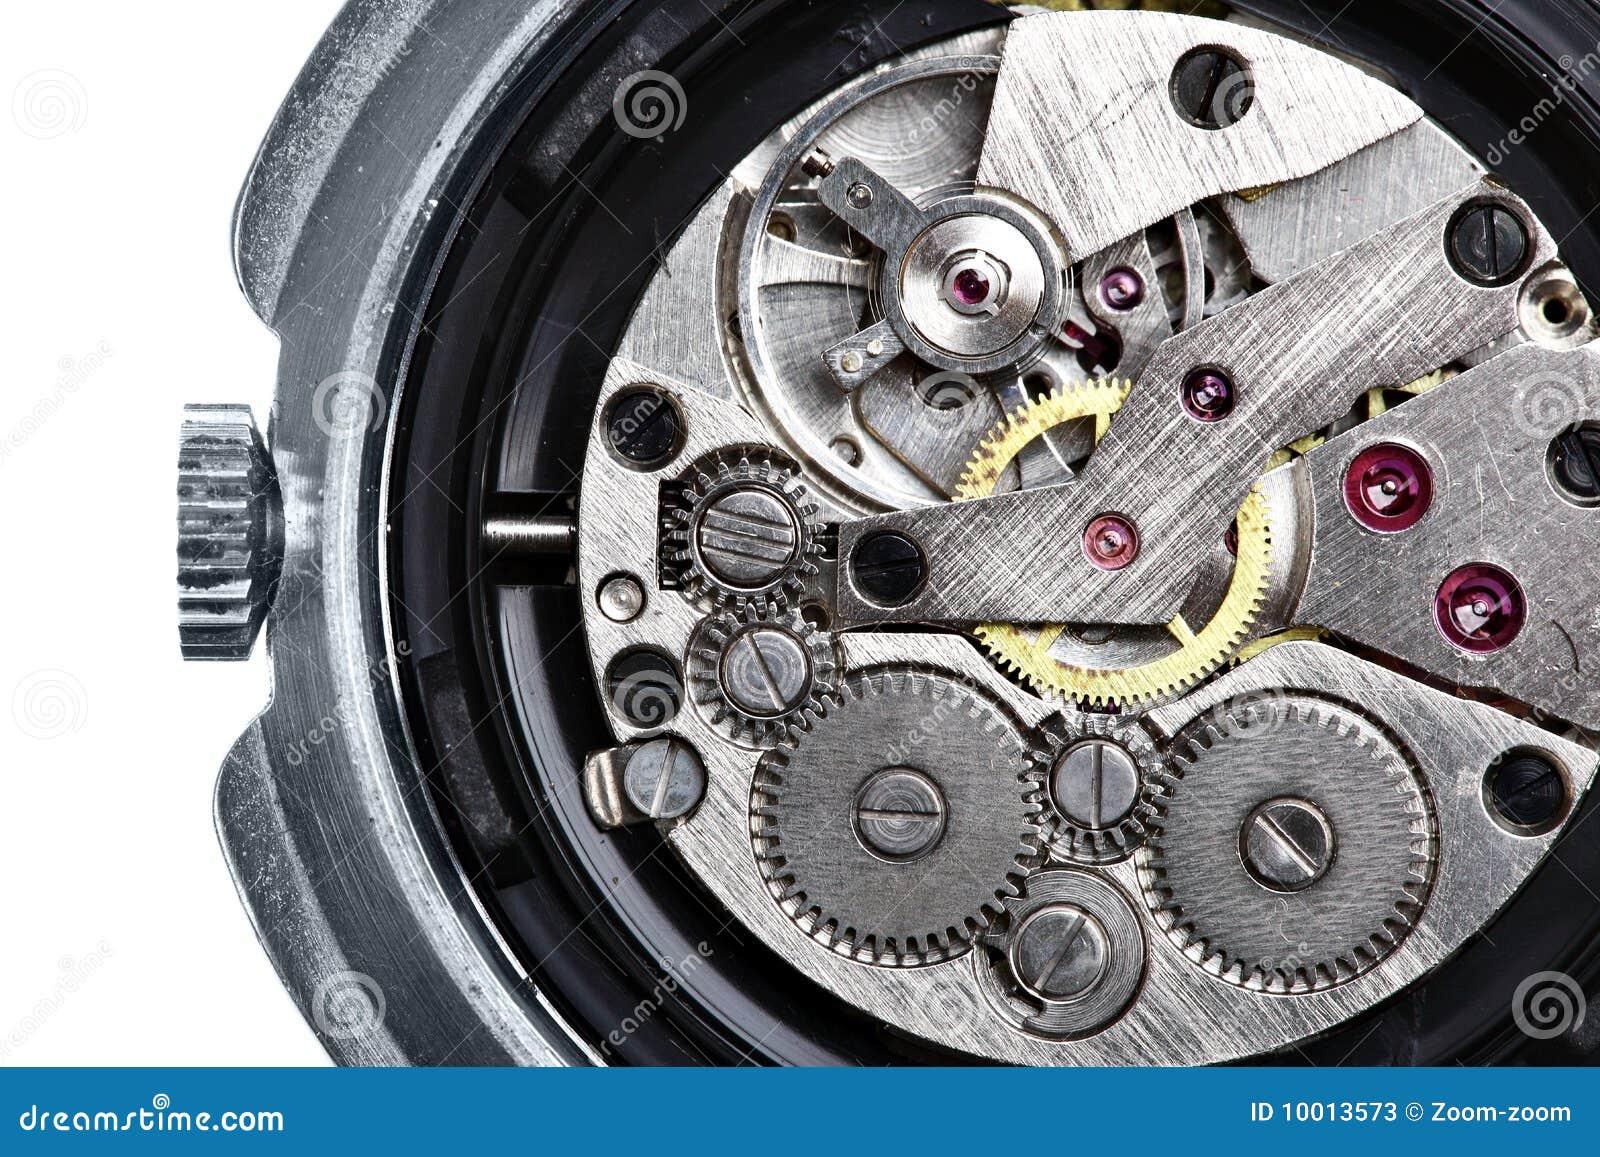 Clockwork wristwatch